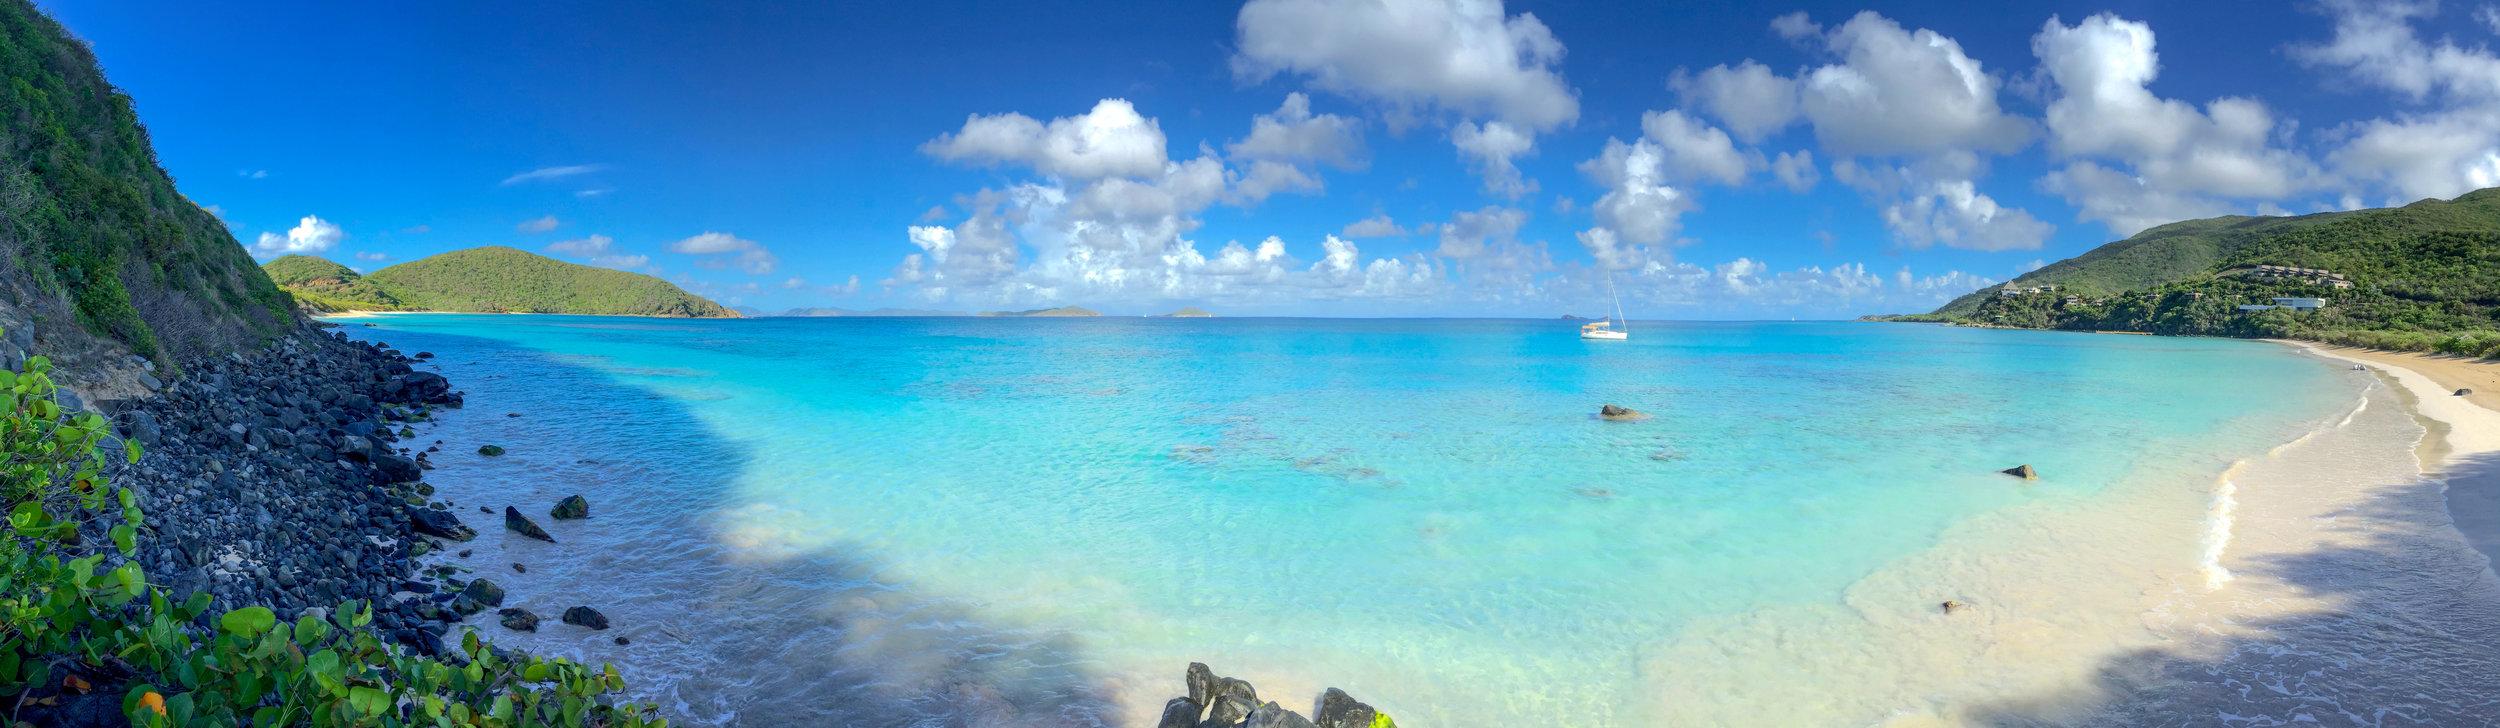 Savannah Bay in the British Virgin Islands